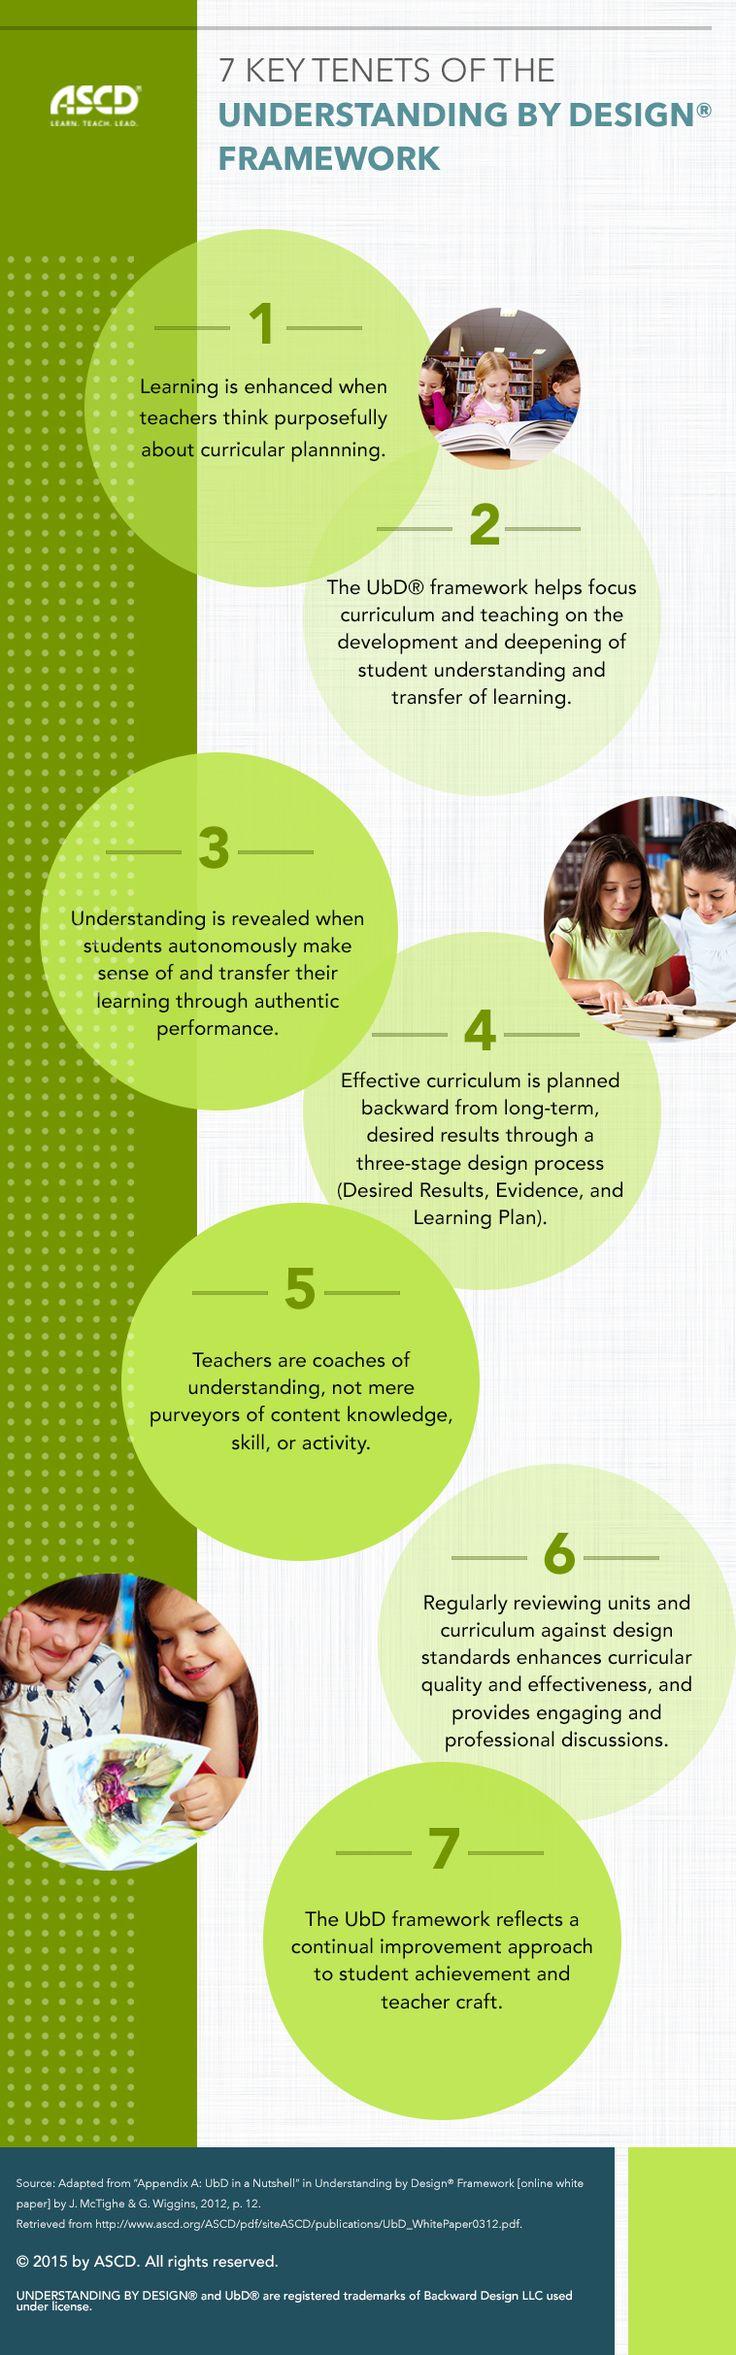 7 Key Tenets of Understanding by Design® Framework.